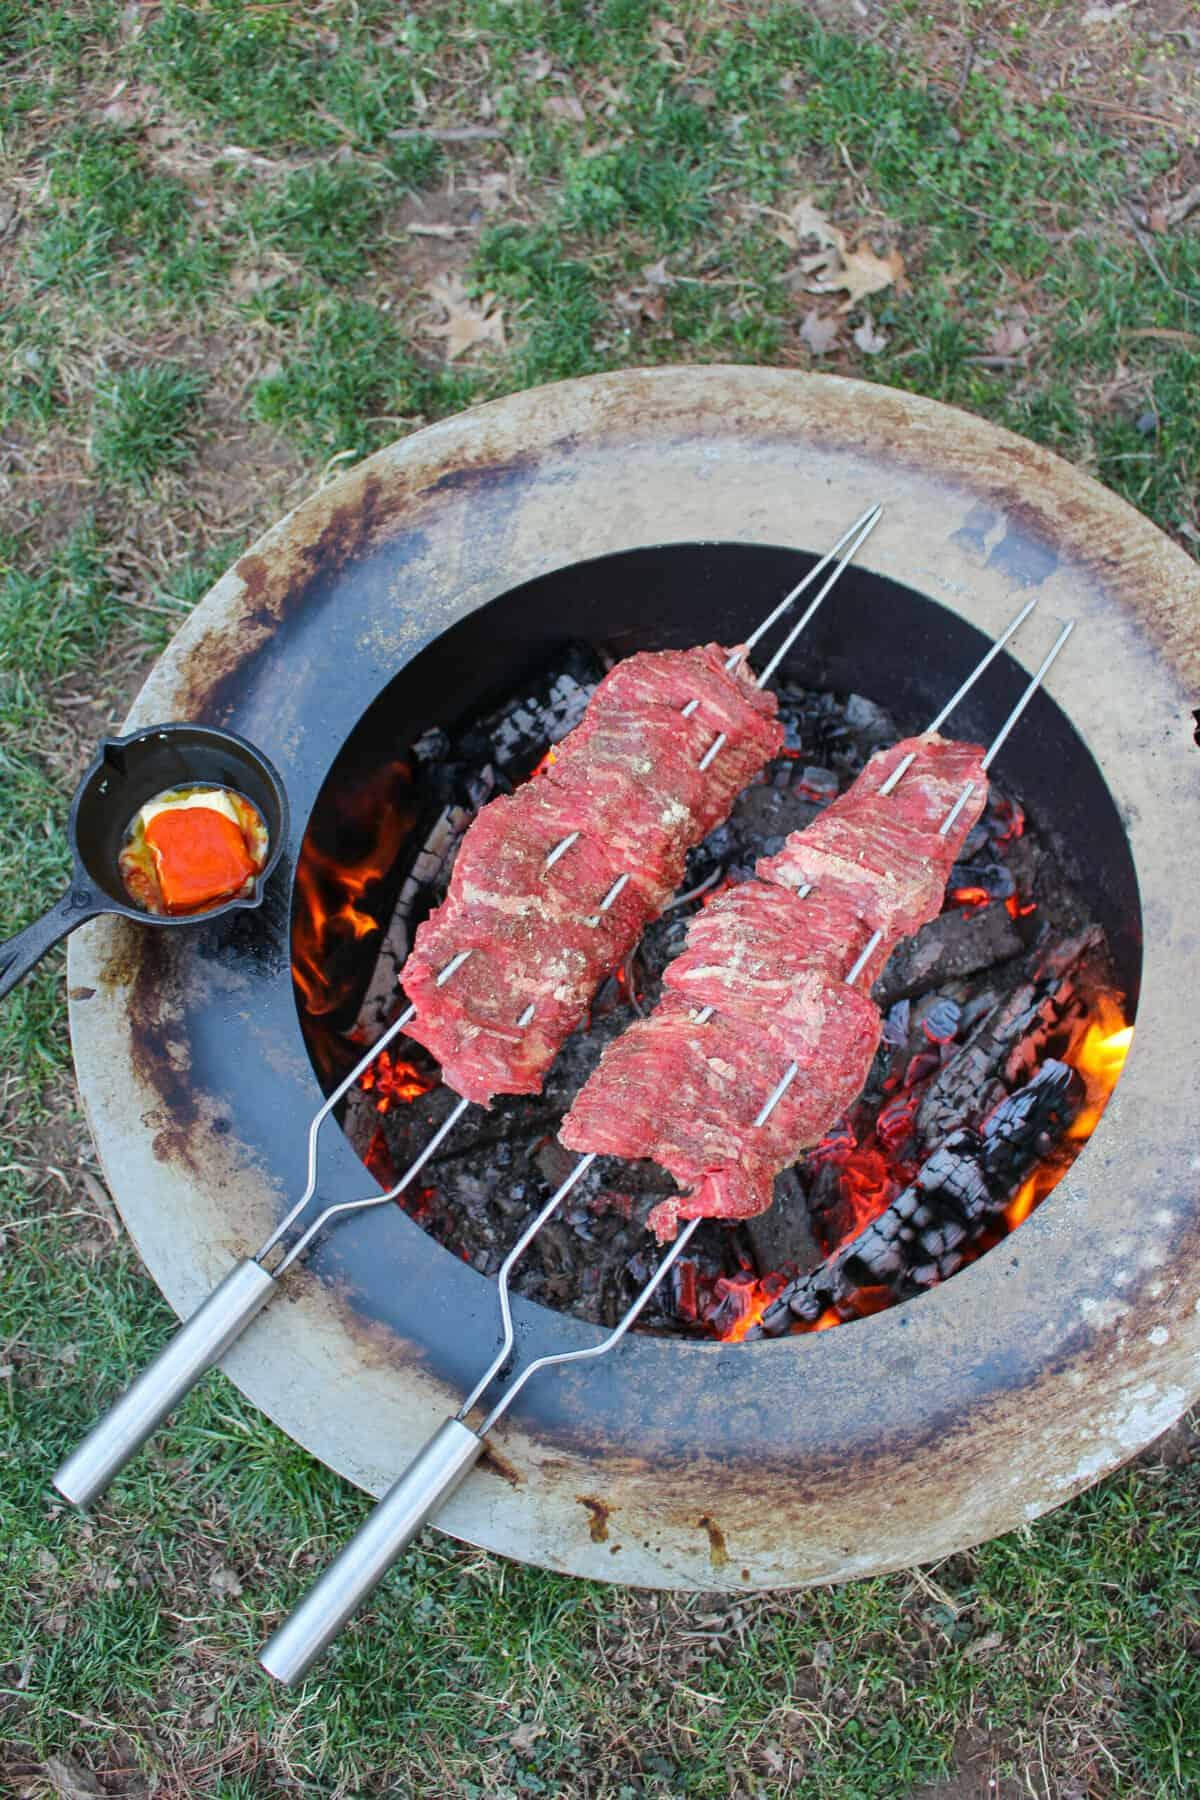 Cheesy Skewered Skirt Steak with Salsa Verde